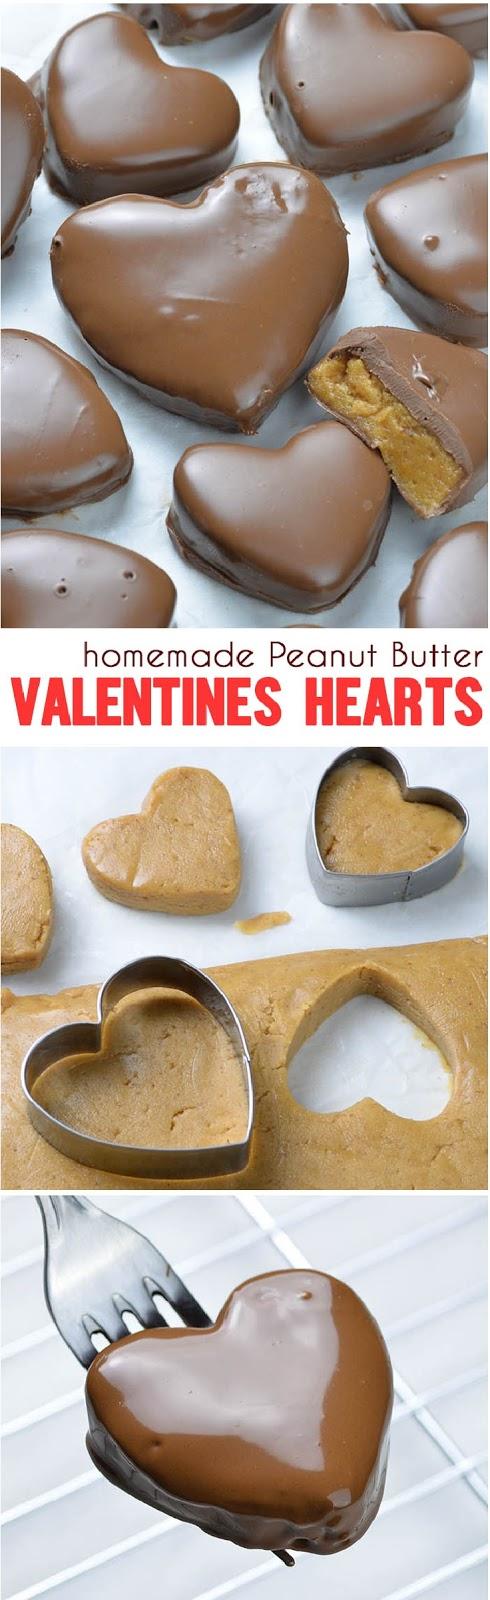 Chocolate Peanut Butter Valentine's Heart